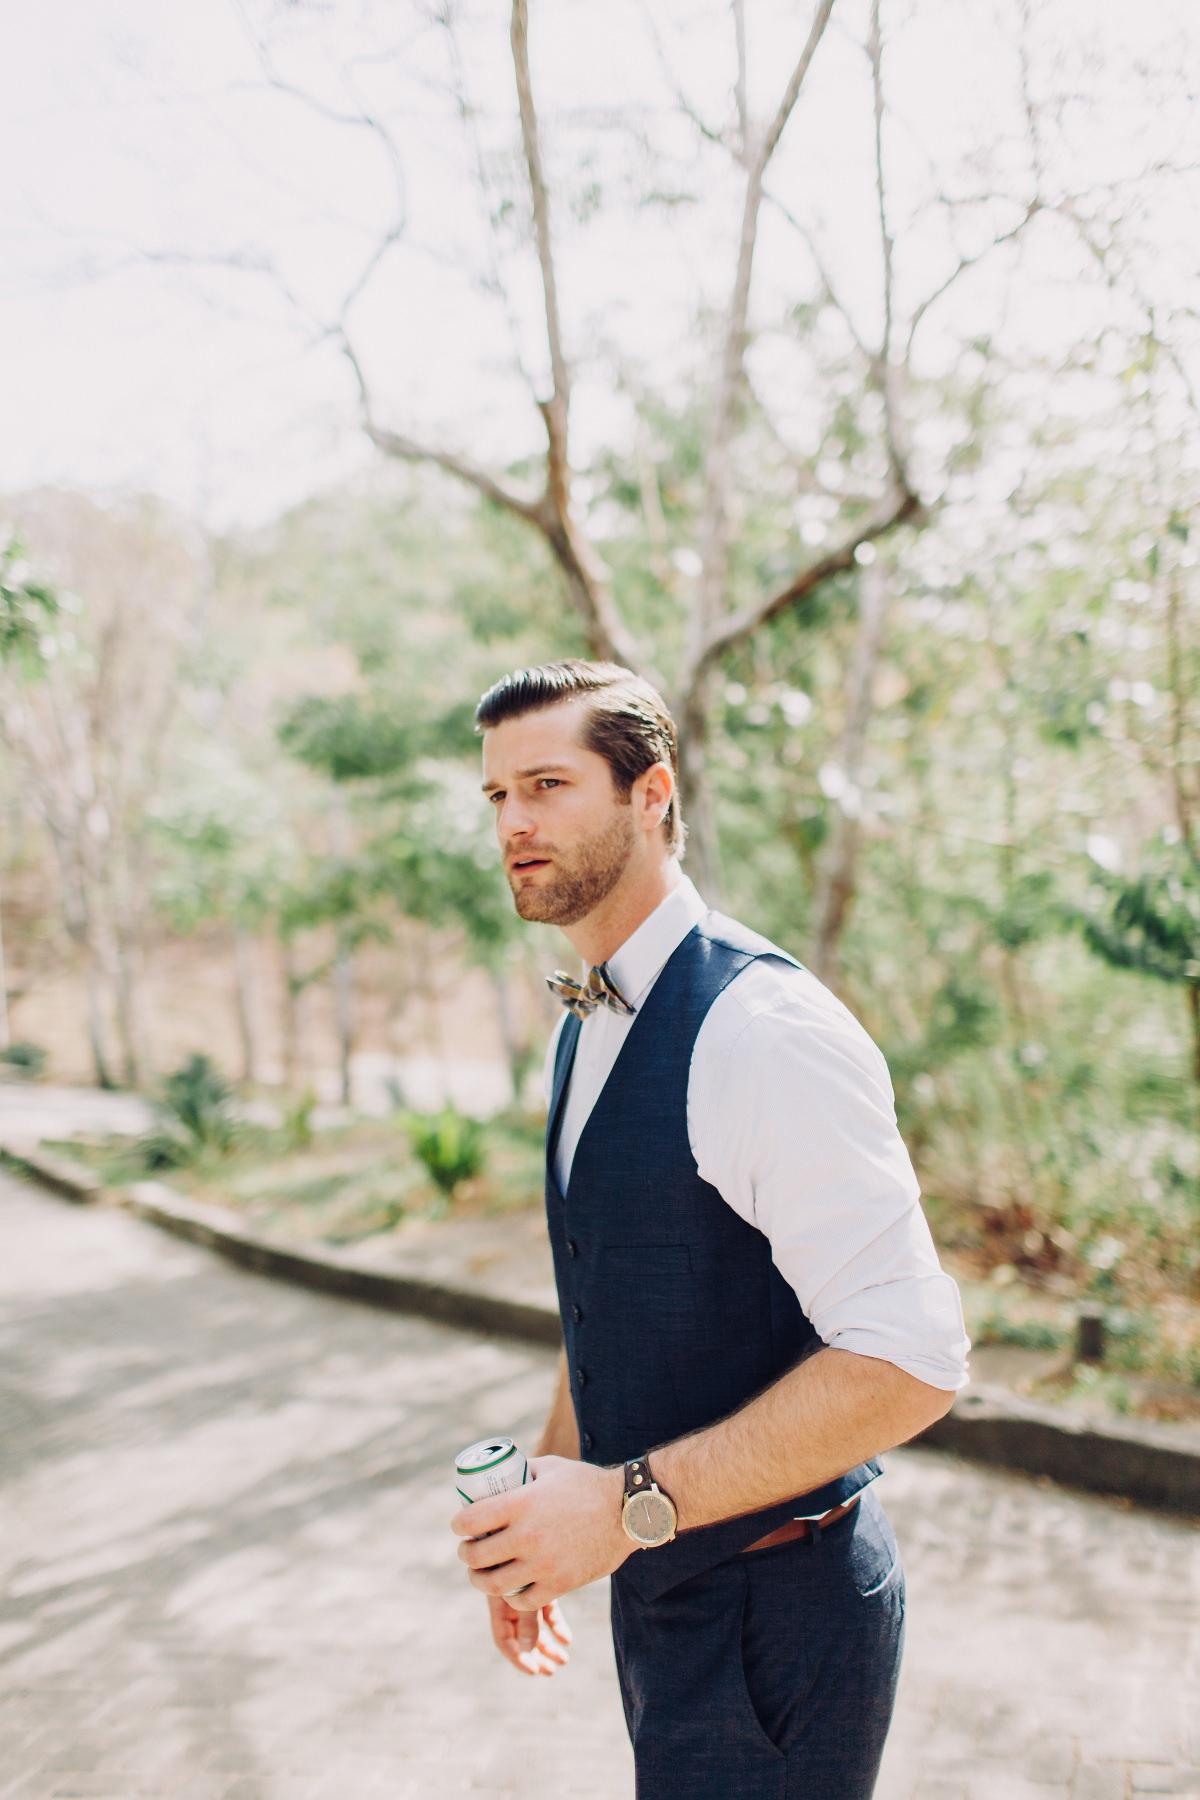 Groom ready for his destination wedding in Aqua Resort Venue Nicaragua